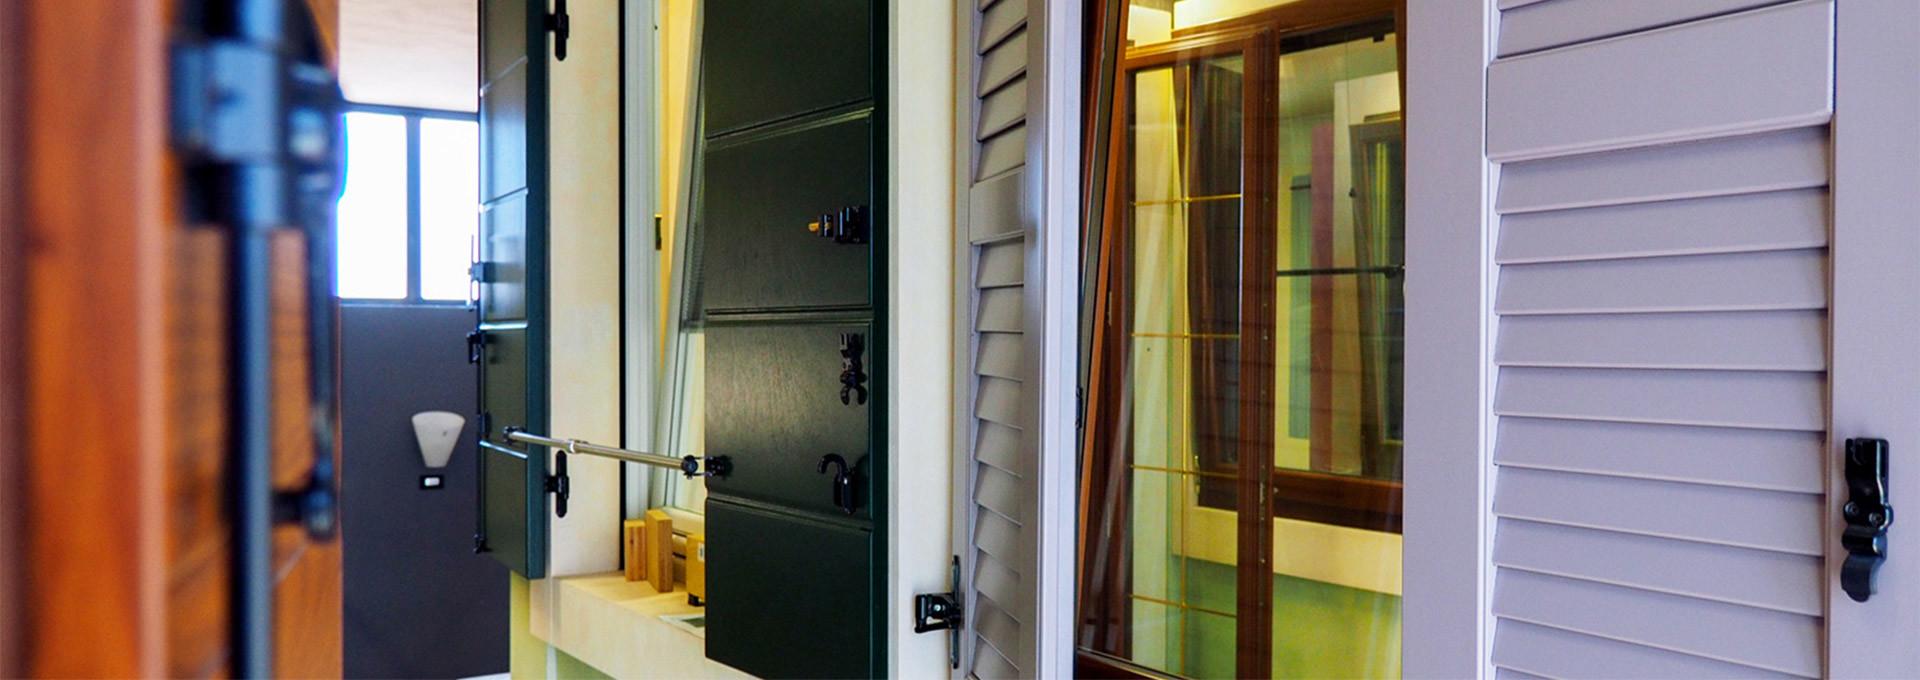 Infissi e finestre PVC Verona